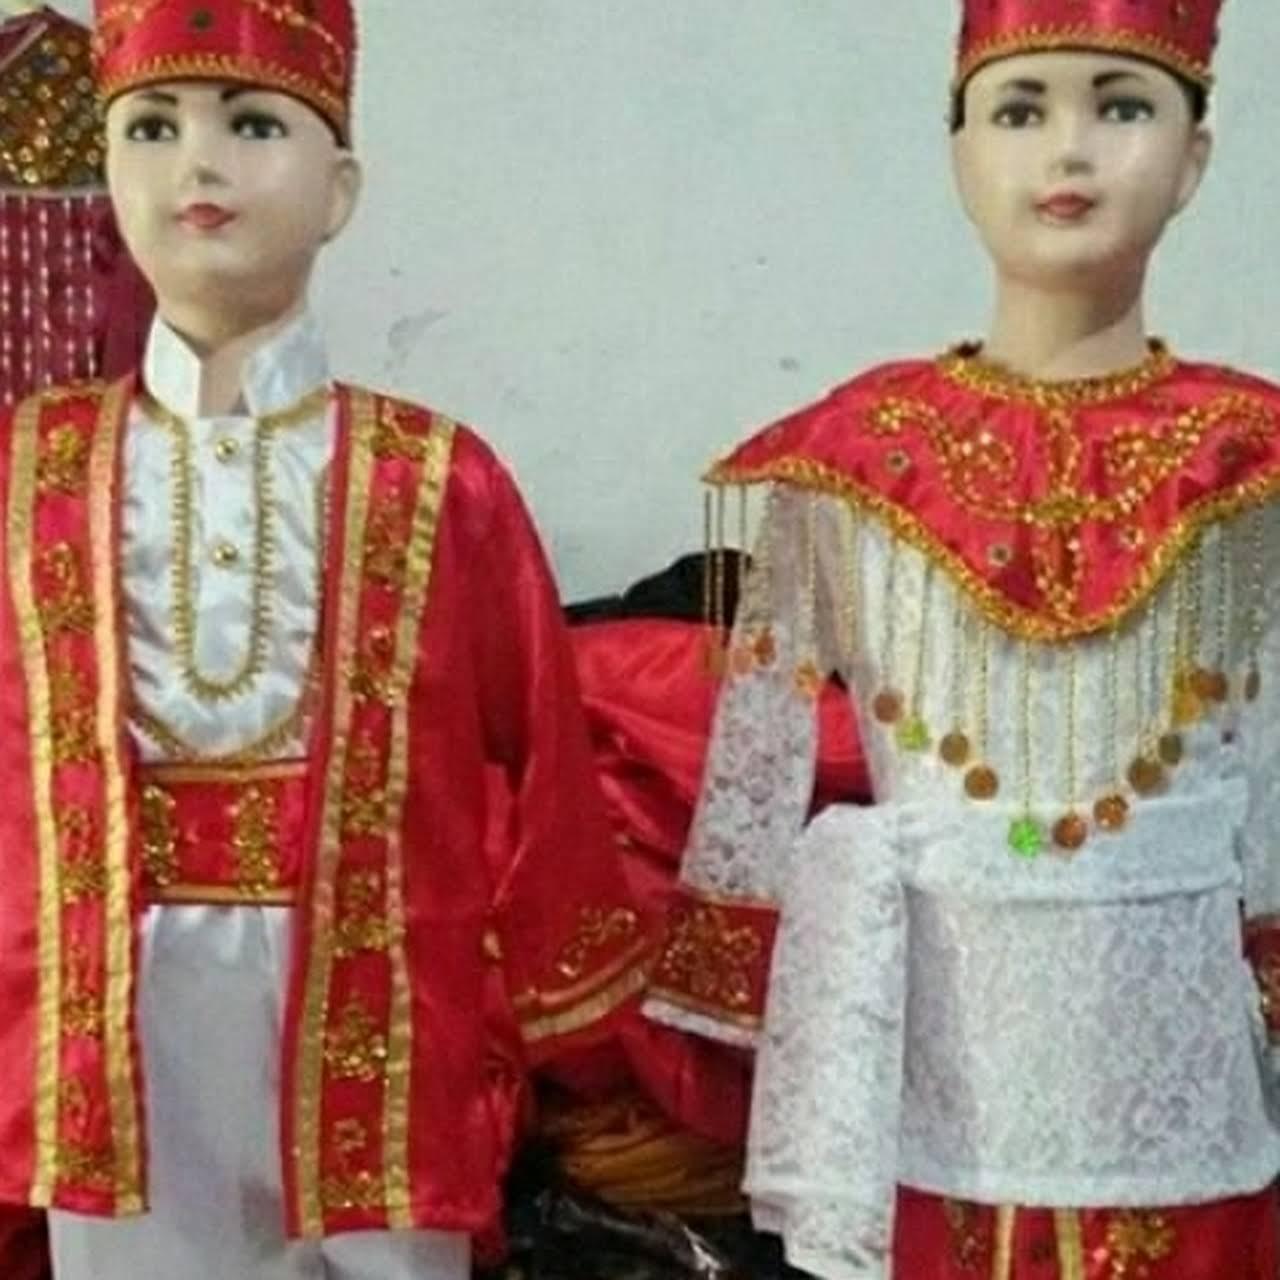 Kostum Medan Jual Sewa Baju Adat Jas Profesi Anak